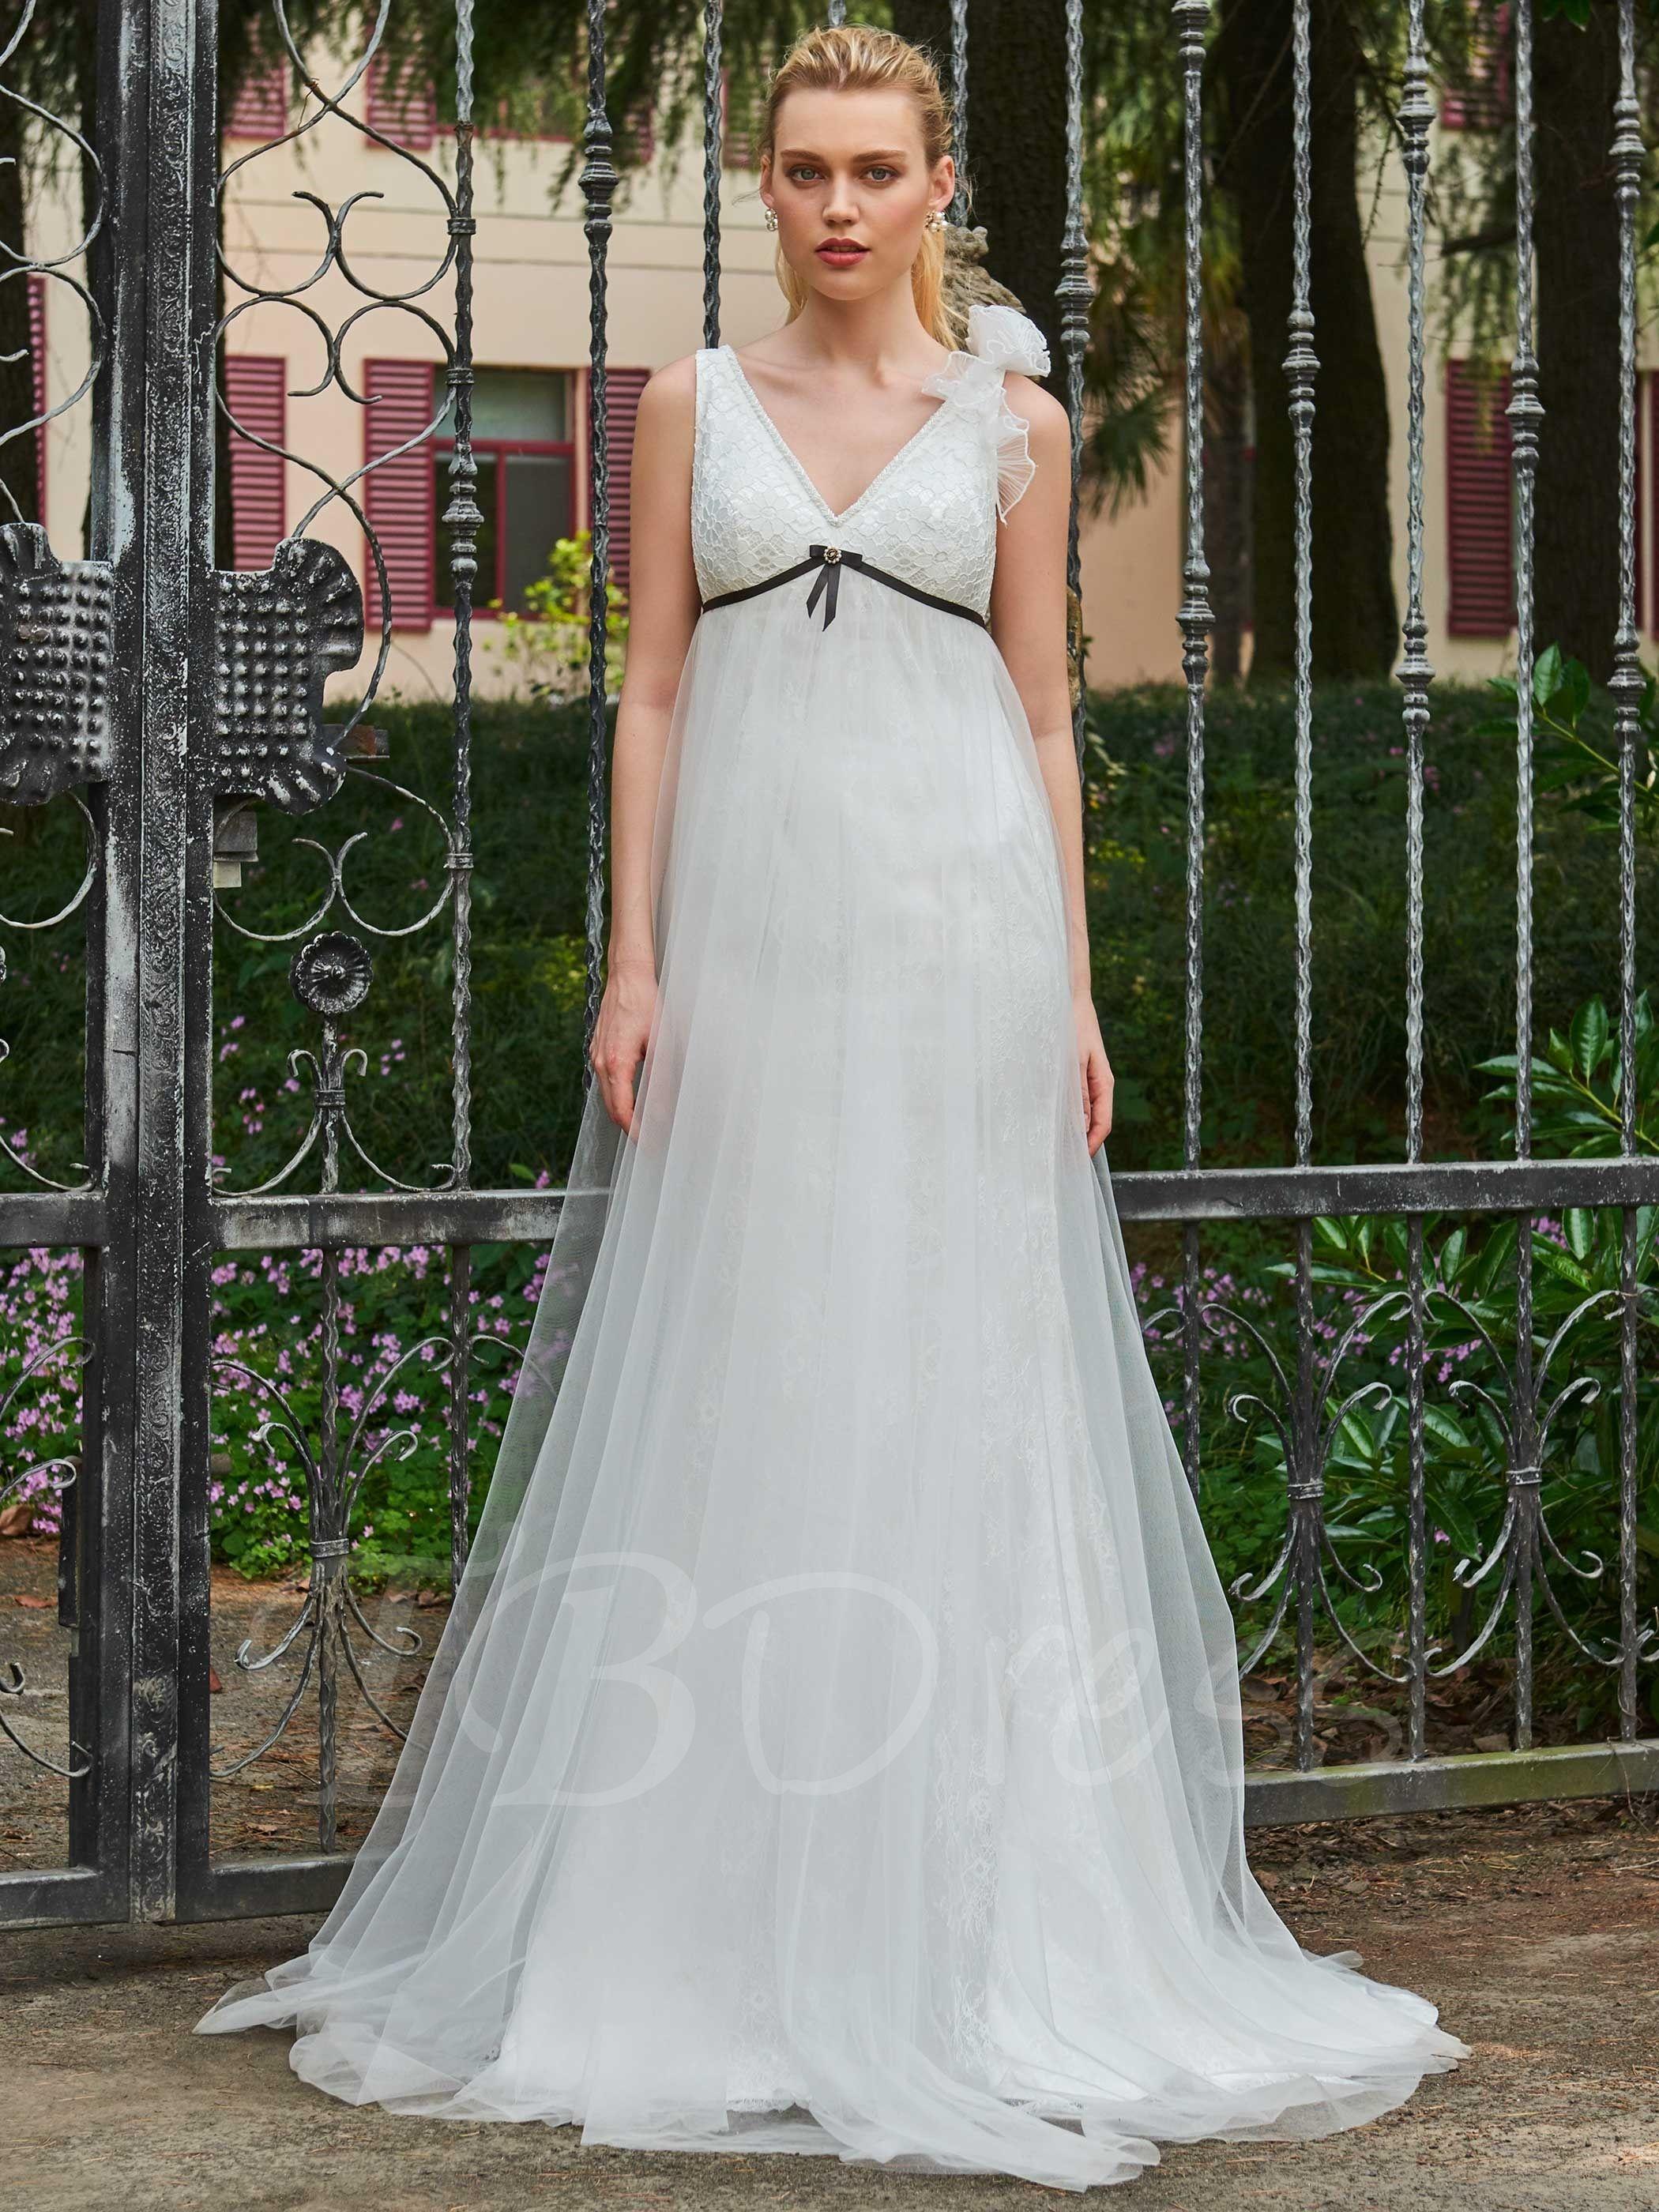 Empire Waist Lace Top ALine Plus Size Wedding Dress (With